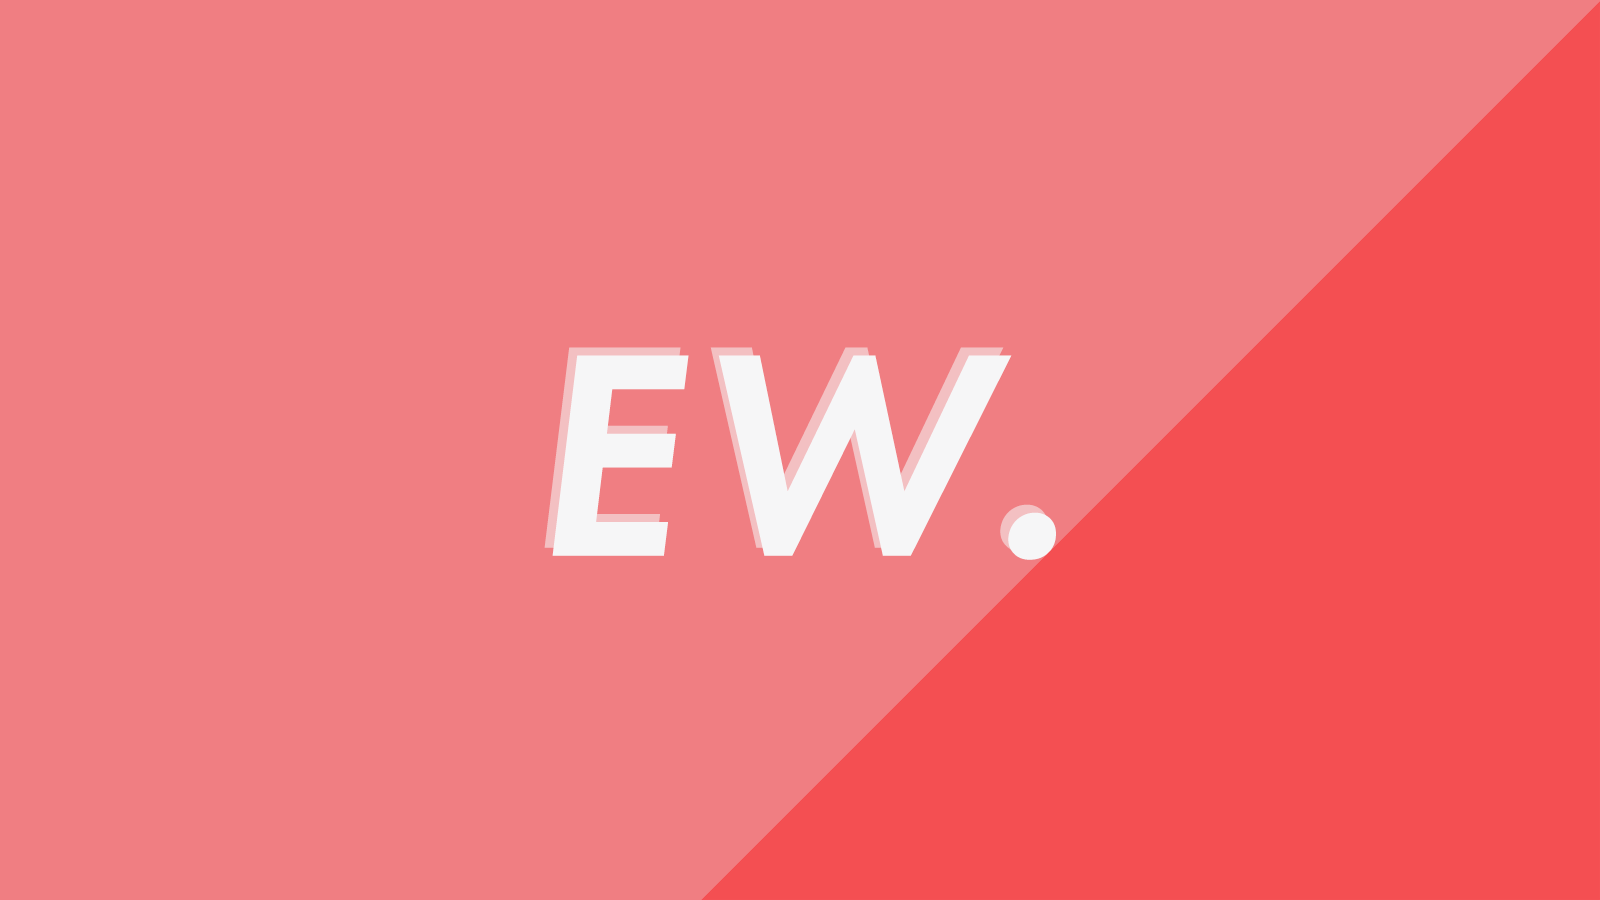 ewwww.png